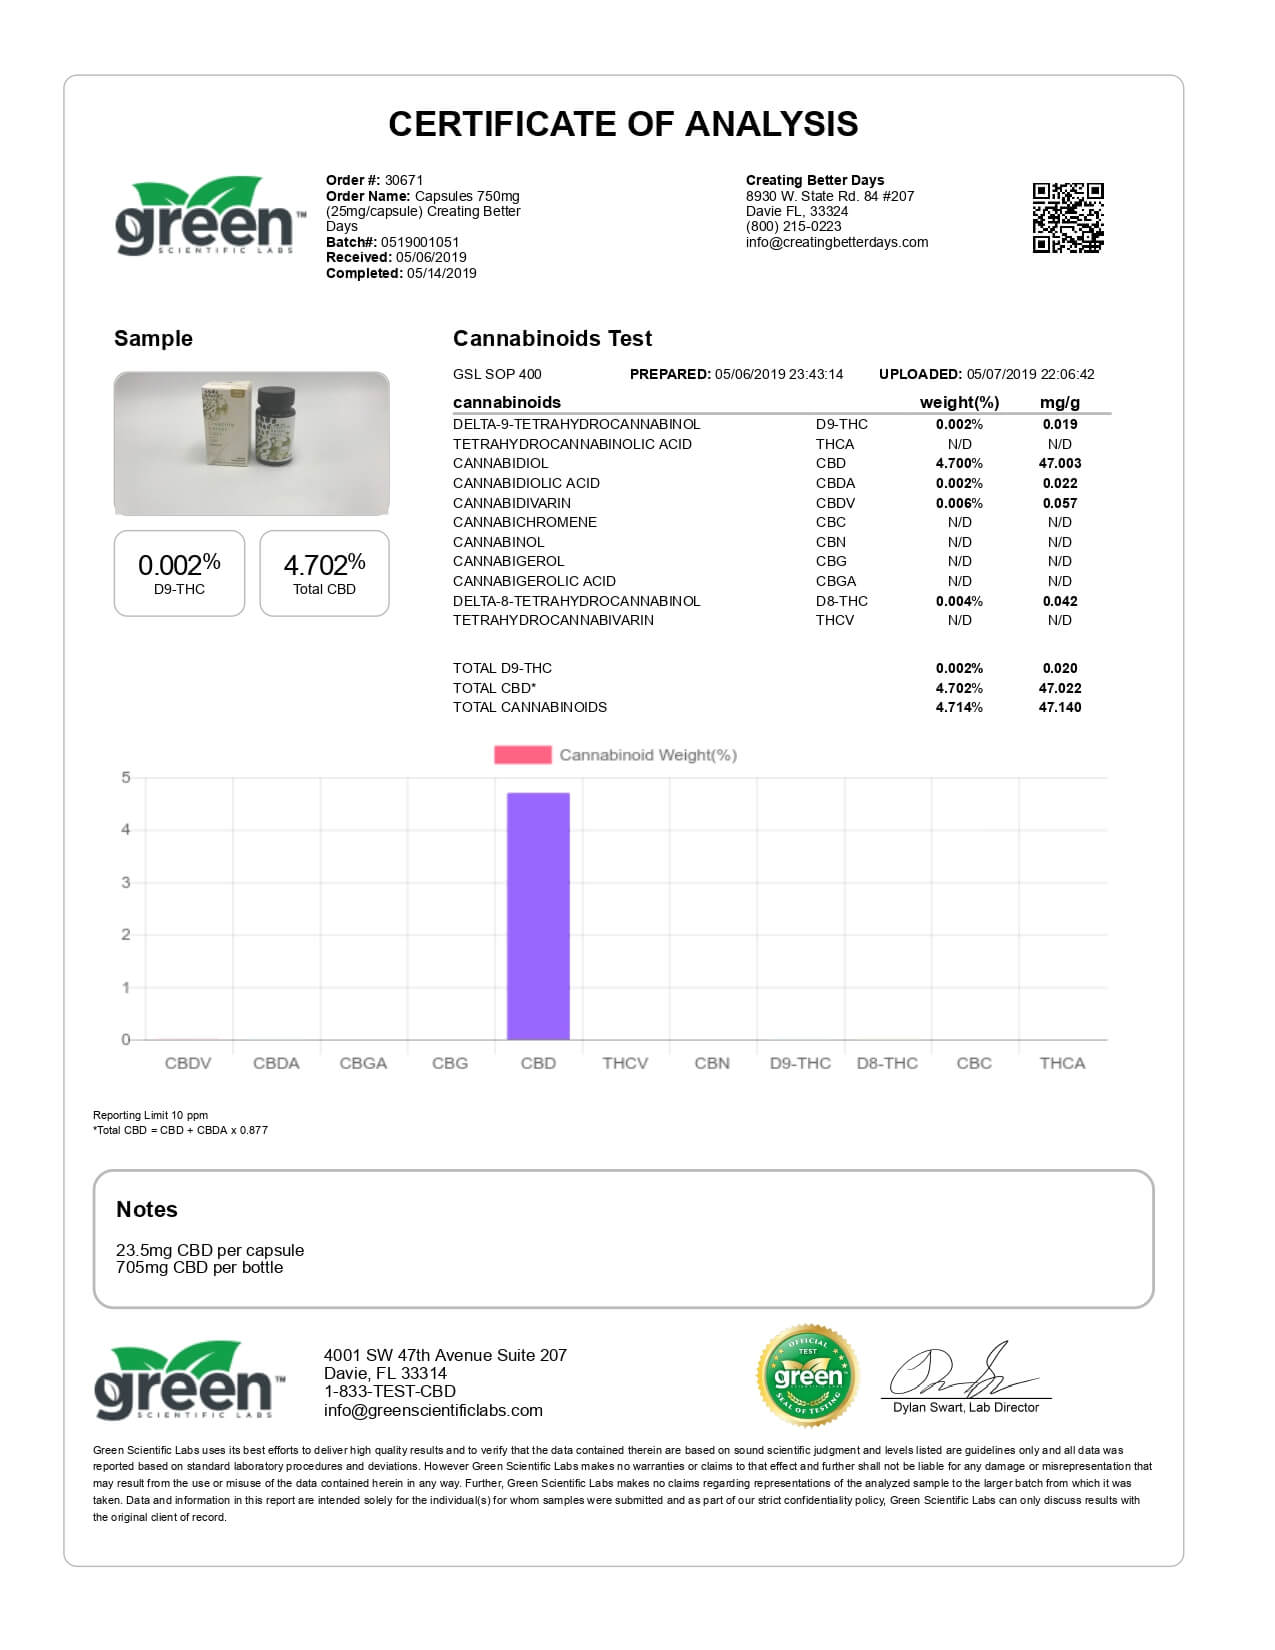 Creating Better Days CBD Gel Caps Lab Report